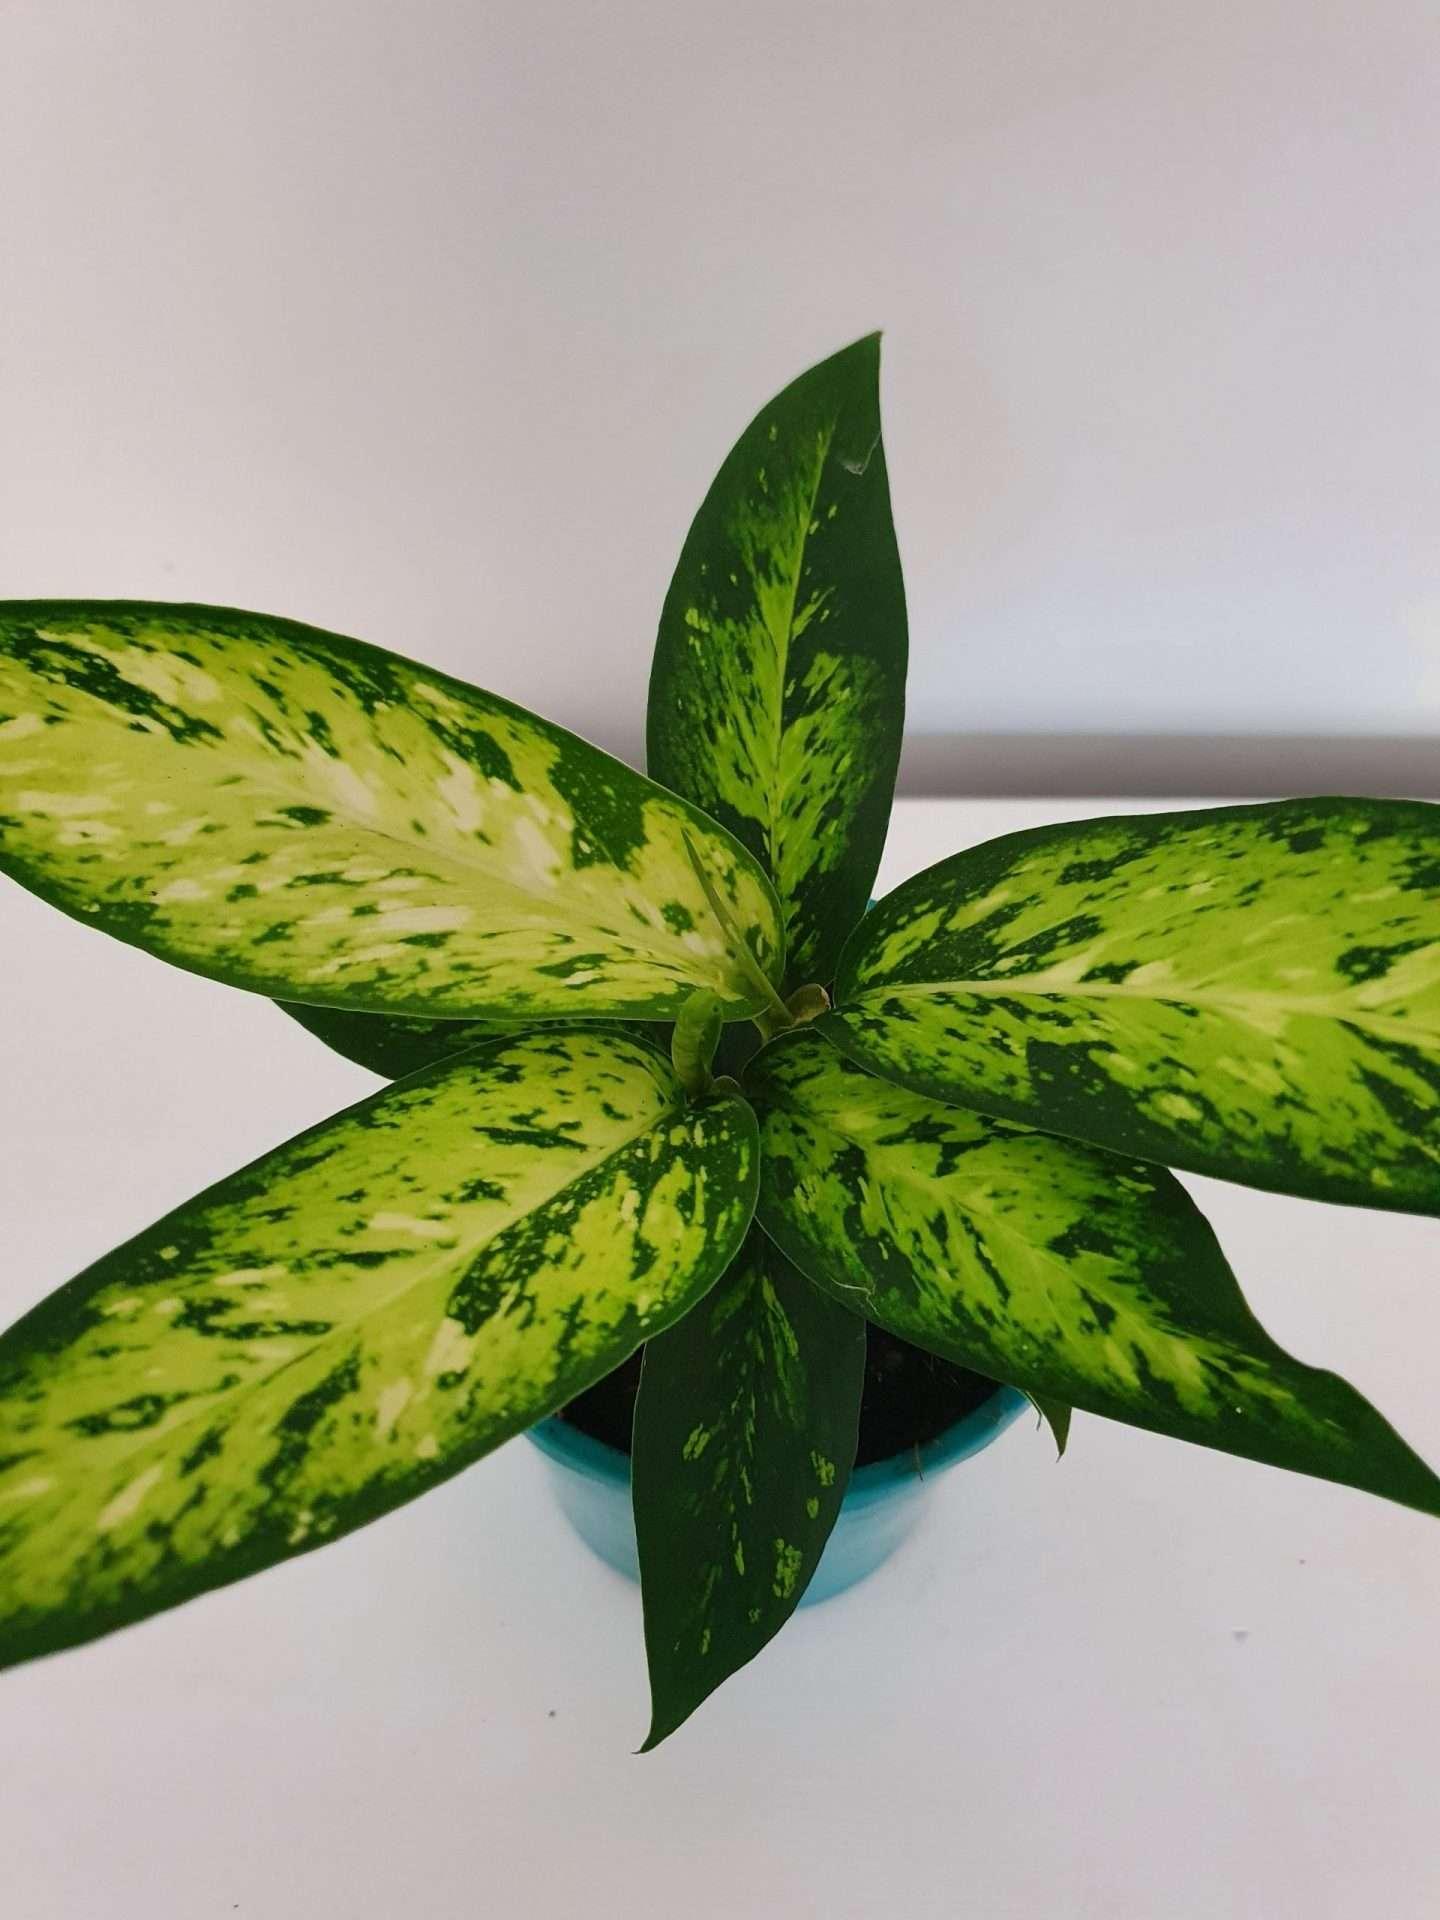 Dieffenbachia Starbright